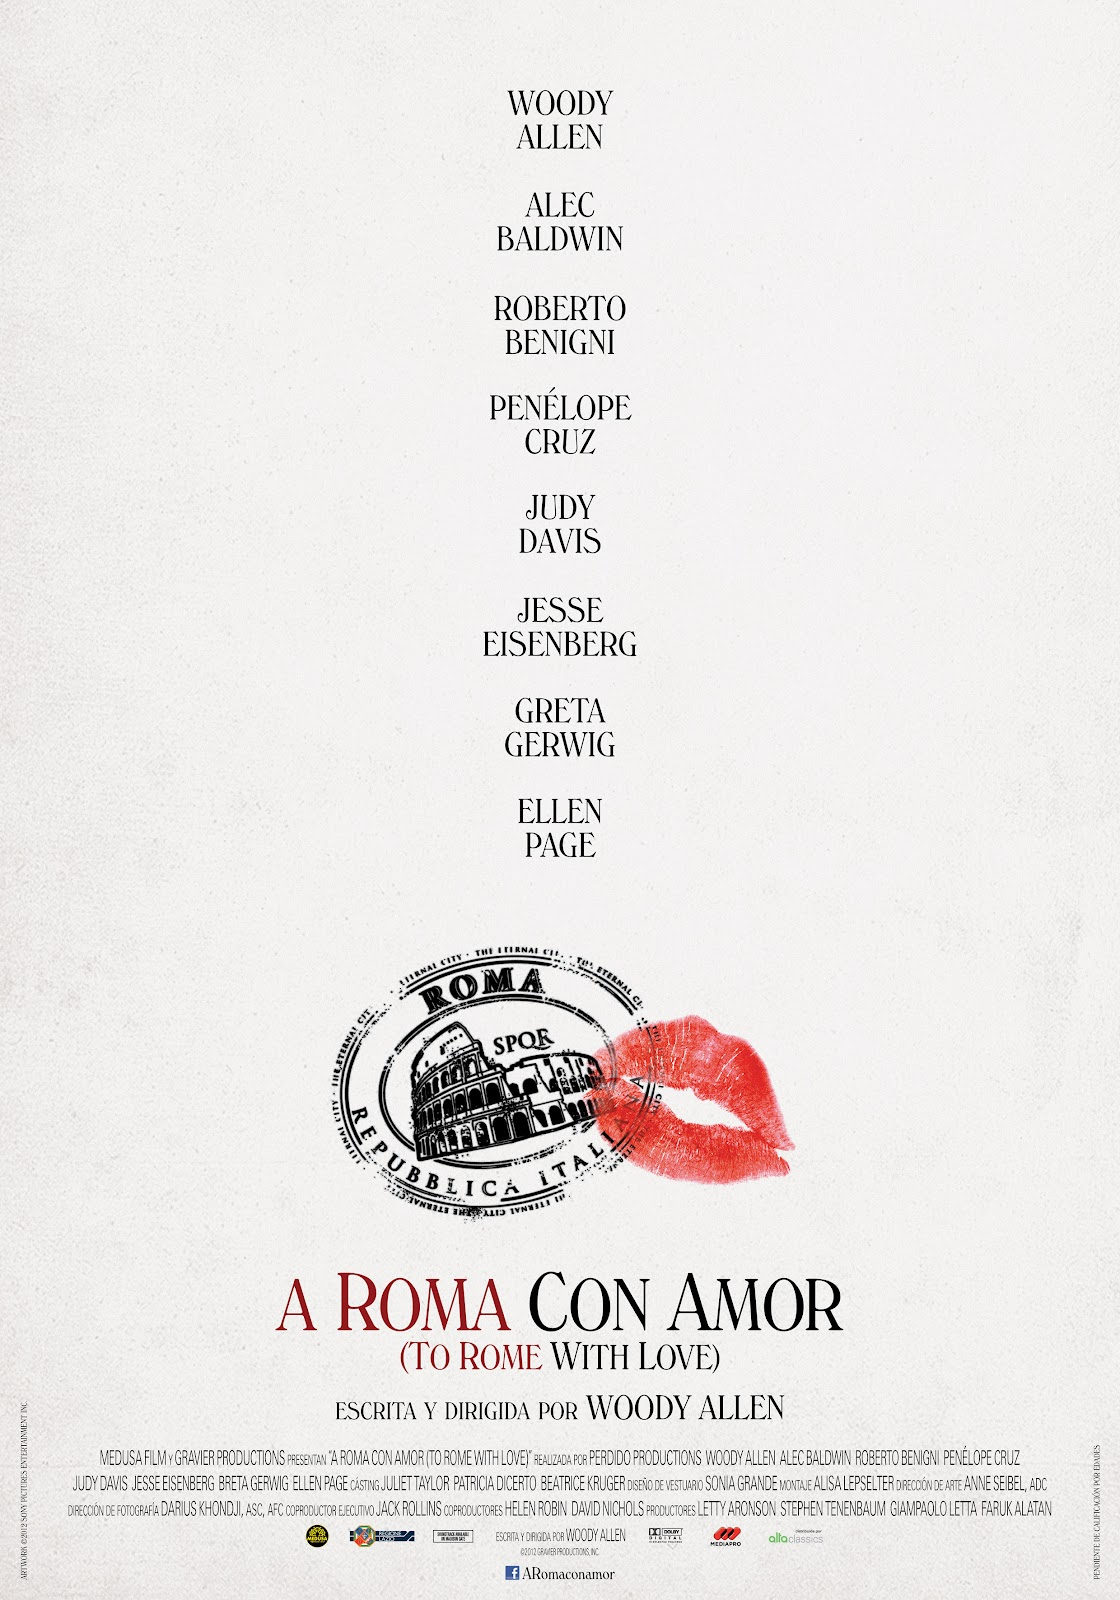 http://3.bp.blogspot.com/-jBk8QrkSskQ/UFg0IHXlA1I/AAAAAAAAA7E/C0jqzE7Pq80/s1600/A-Roma-con-Amor-Poster.jpg